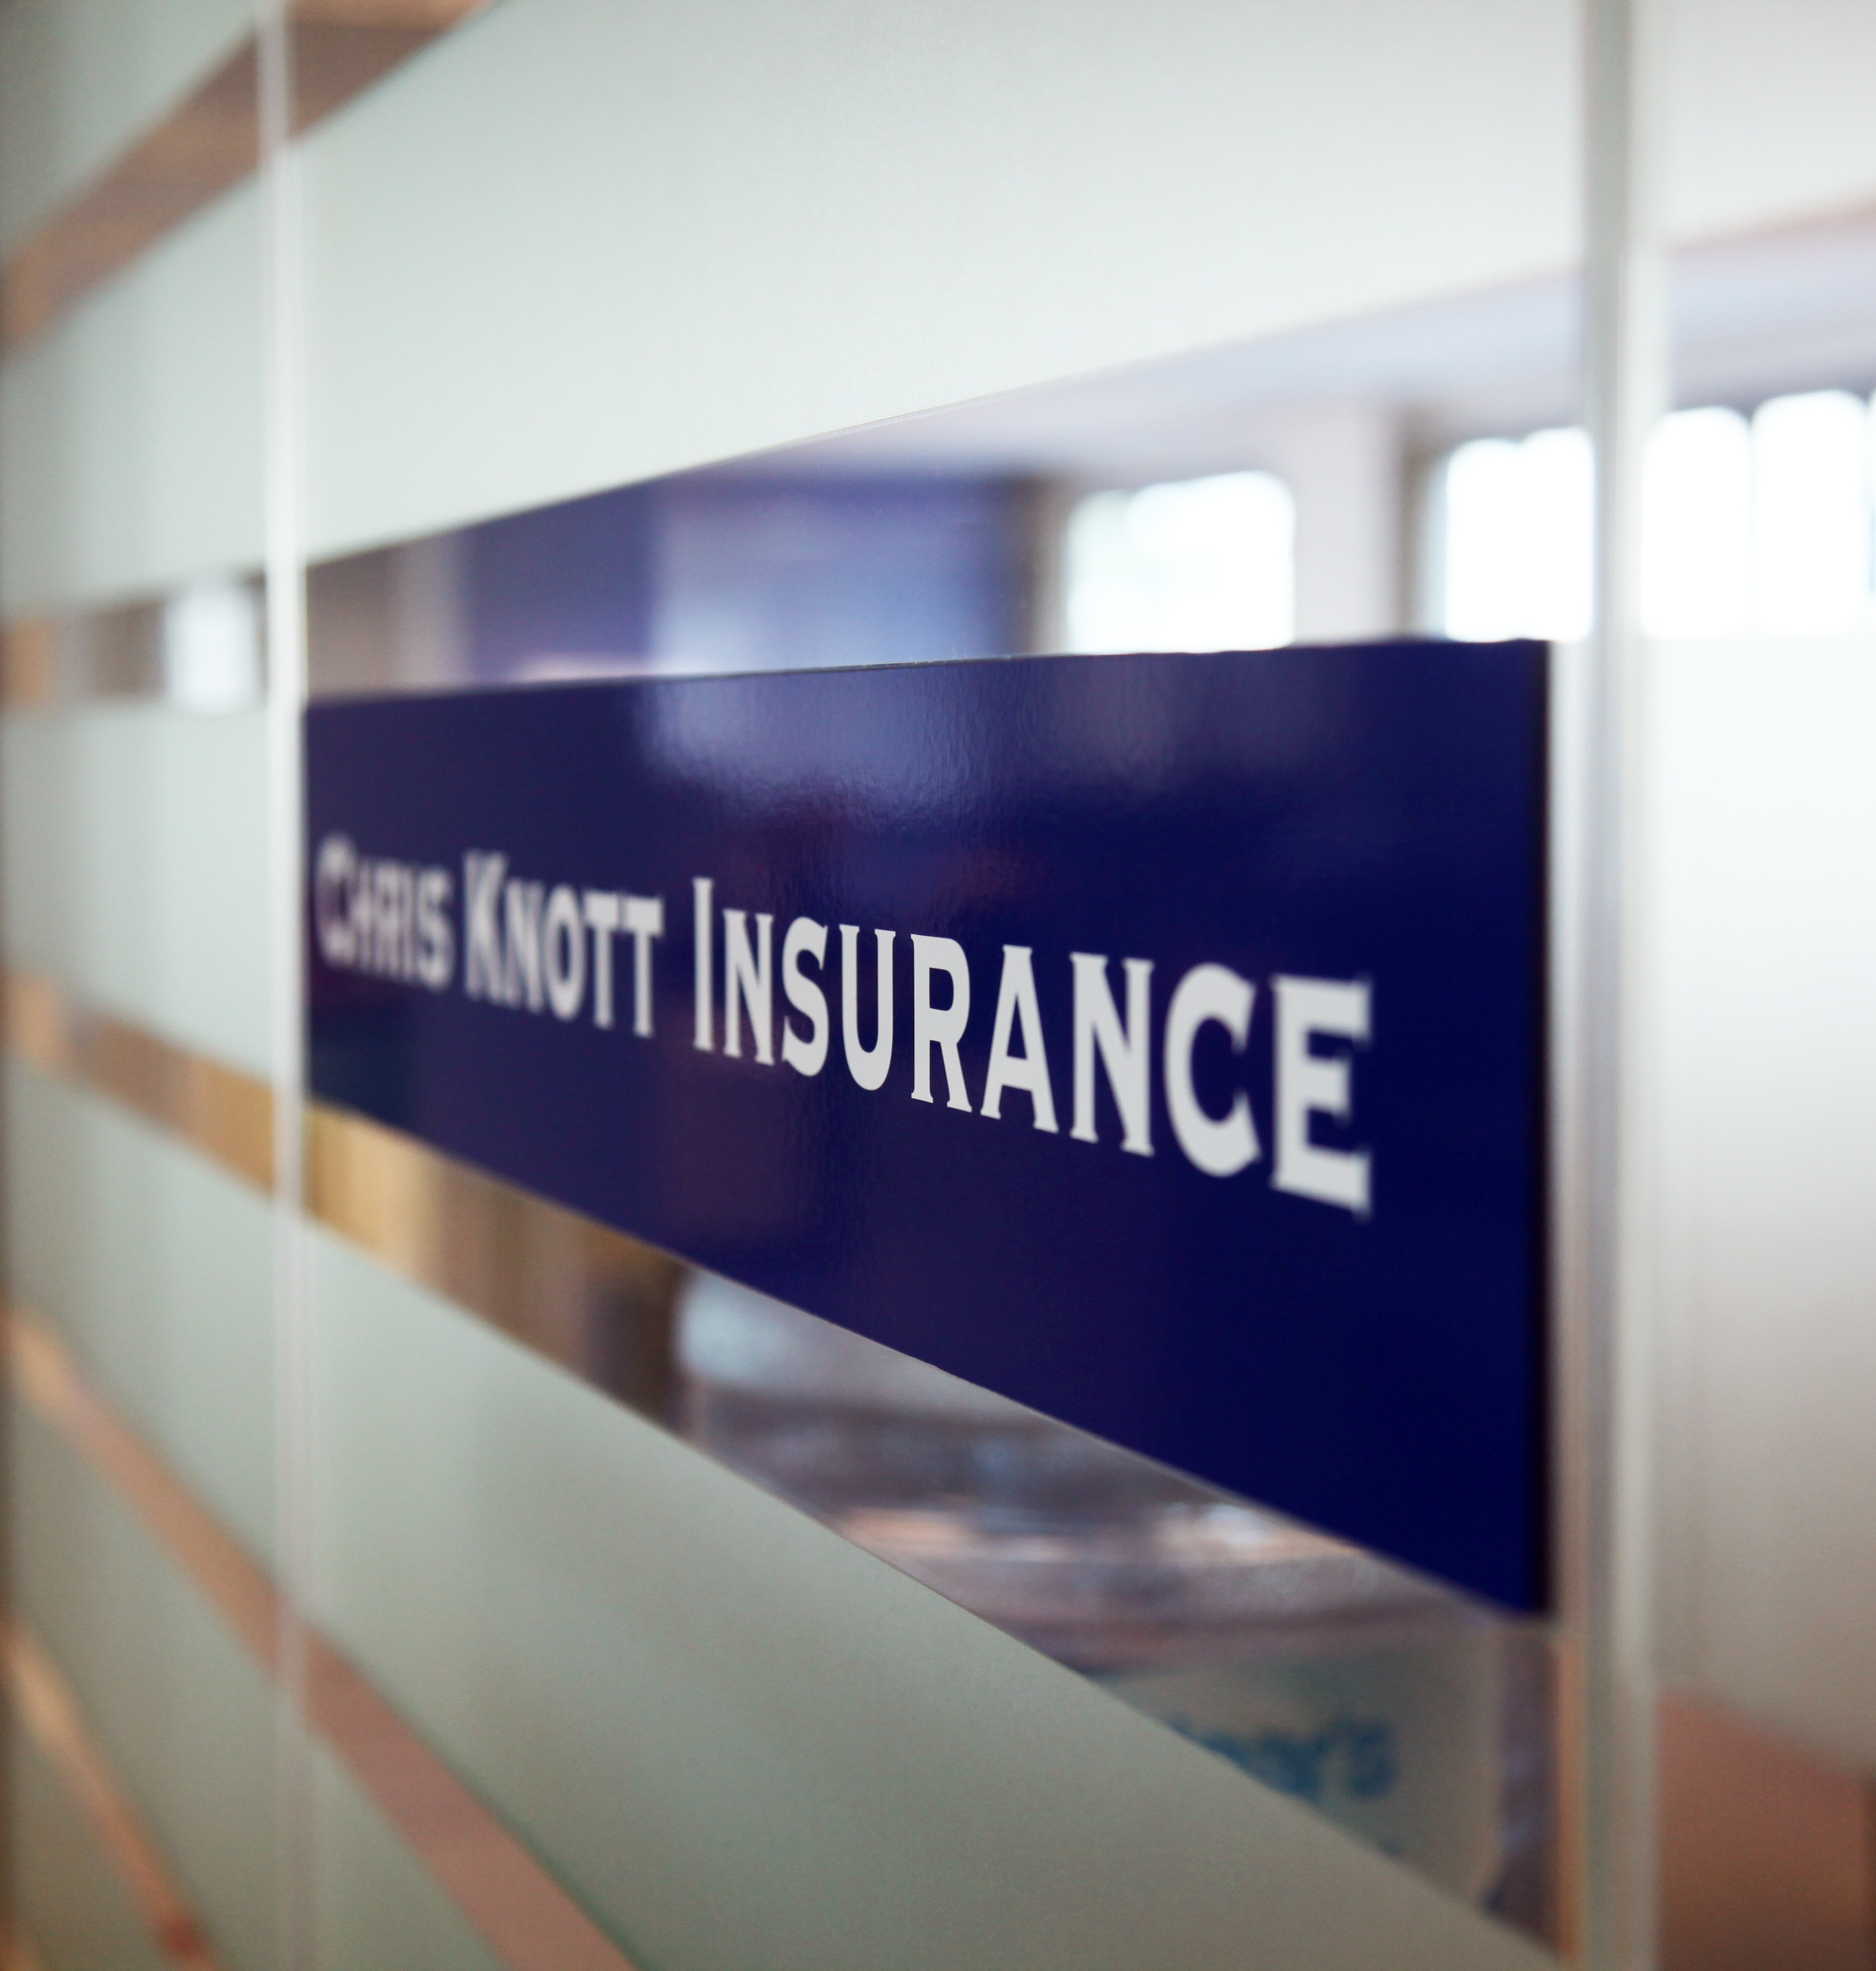 Chris Knott Insurance >> Chris Knott Insurance Linkedin